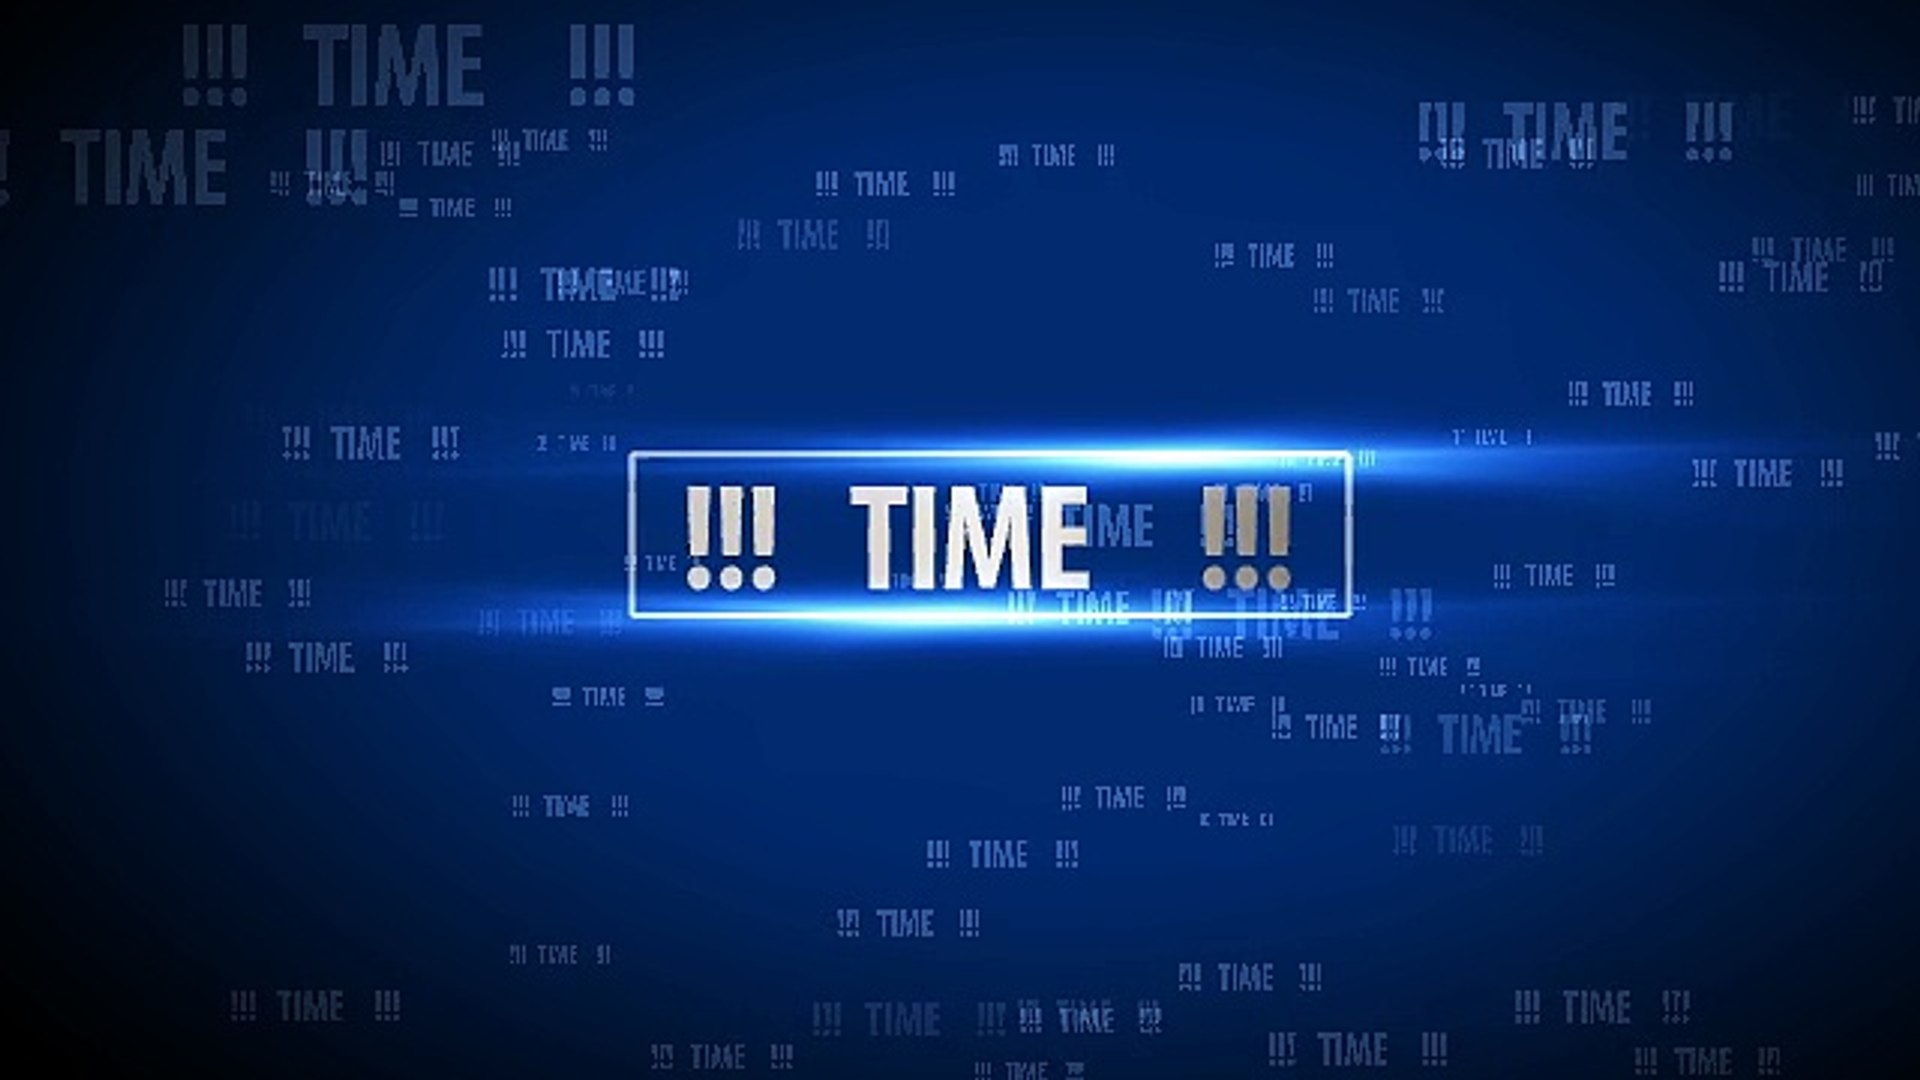 Time Bazar Jodi chart, Time Bazar Penal Chart, Time Bazar Open to close,  Time Bazar live result - Mardmatka